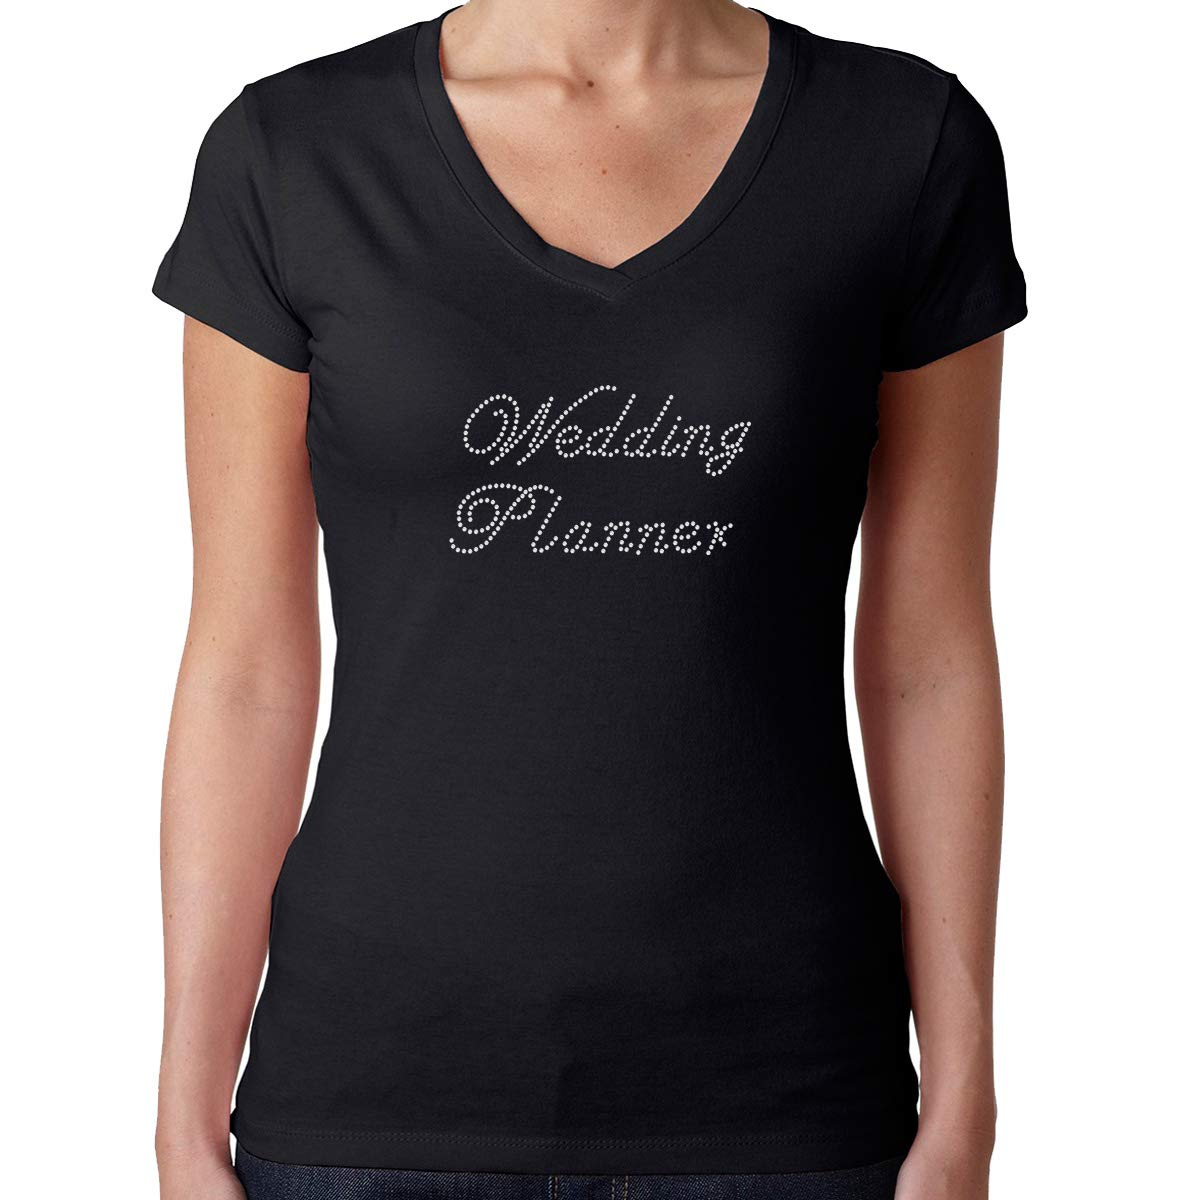 Womens T-Shirt Rhinestone Bling Black Tee Wedding Planner Script V-Neck Medium